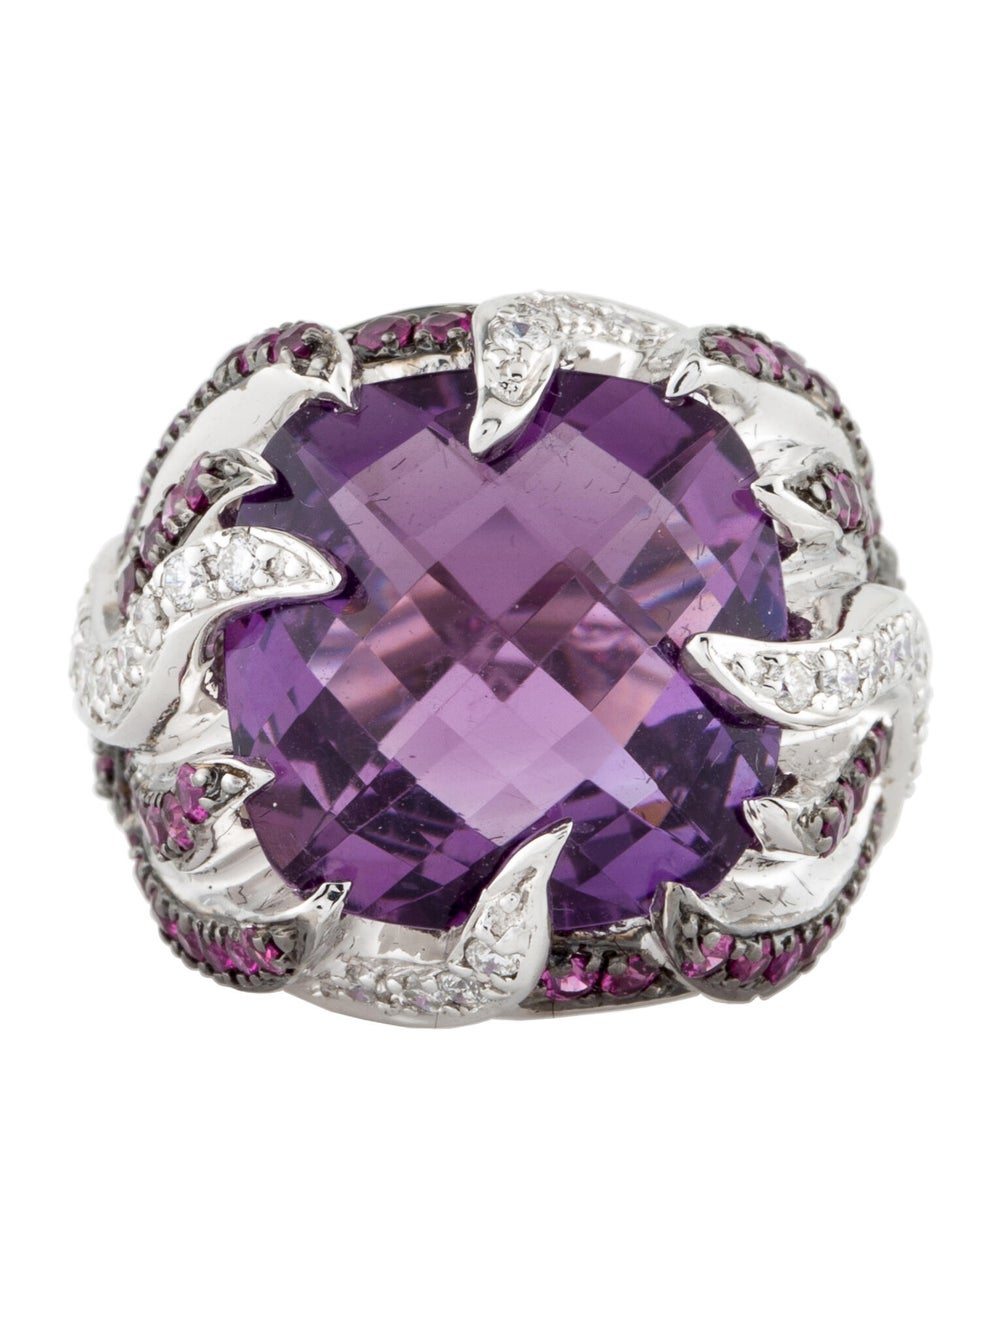 Ring 14K Amethyst, Ruby & Diamond Cocktail Ring S… - image 3